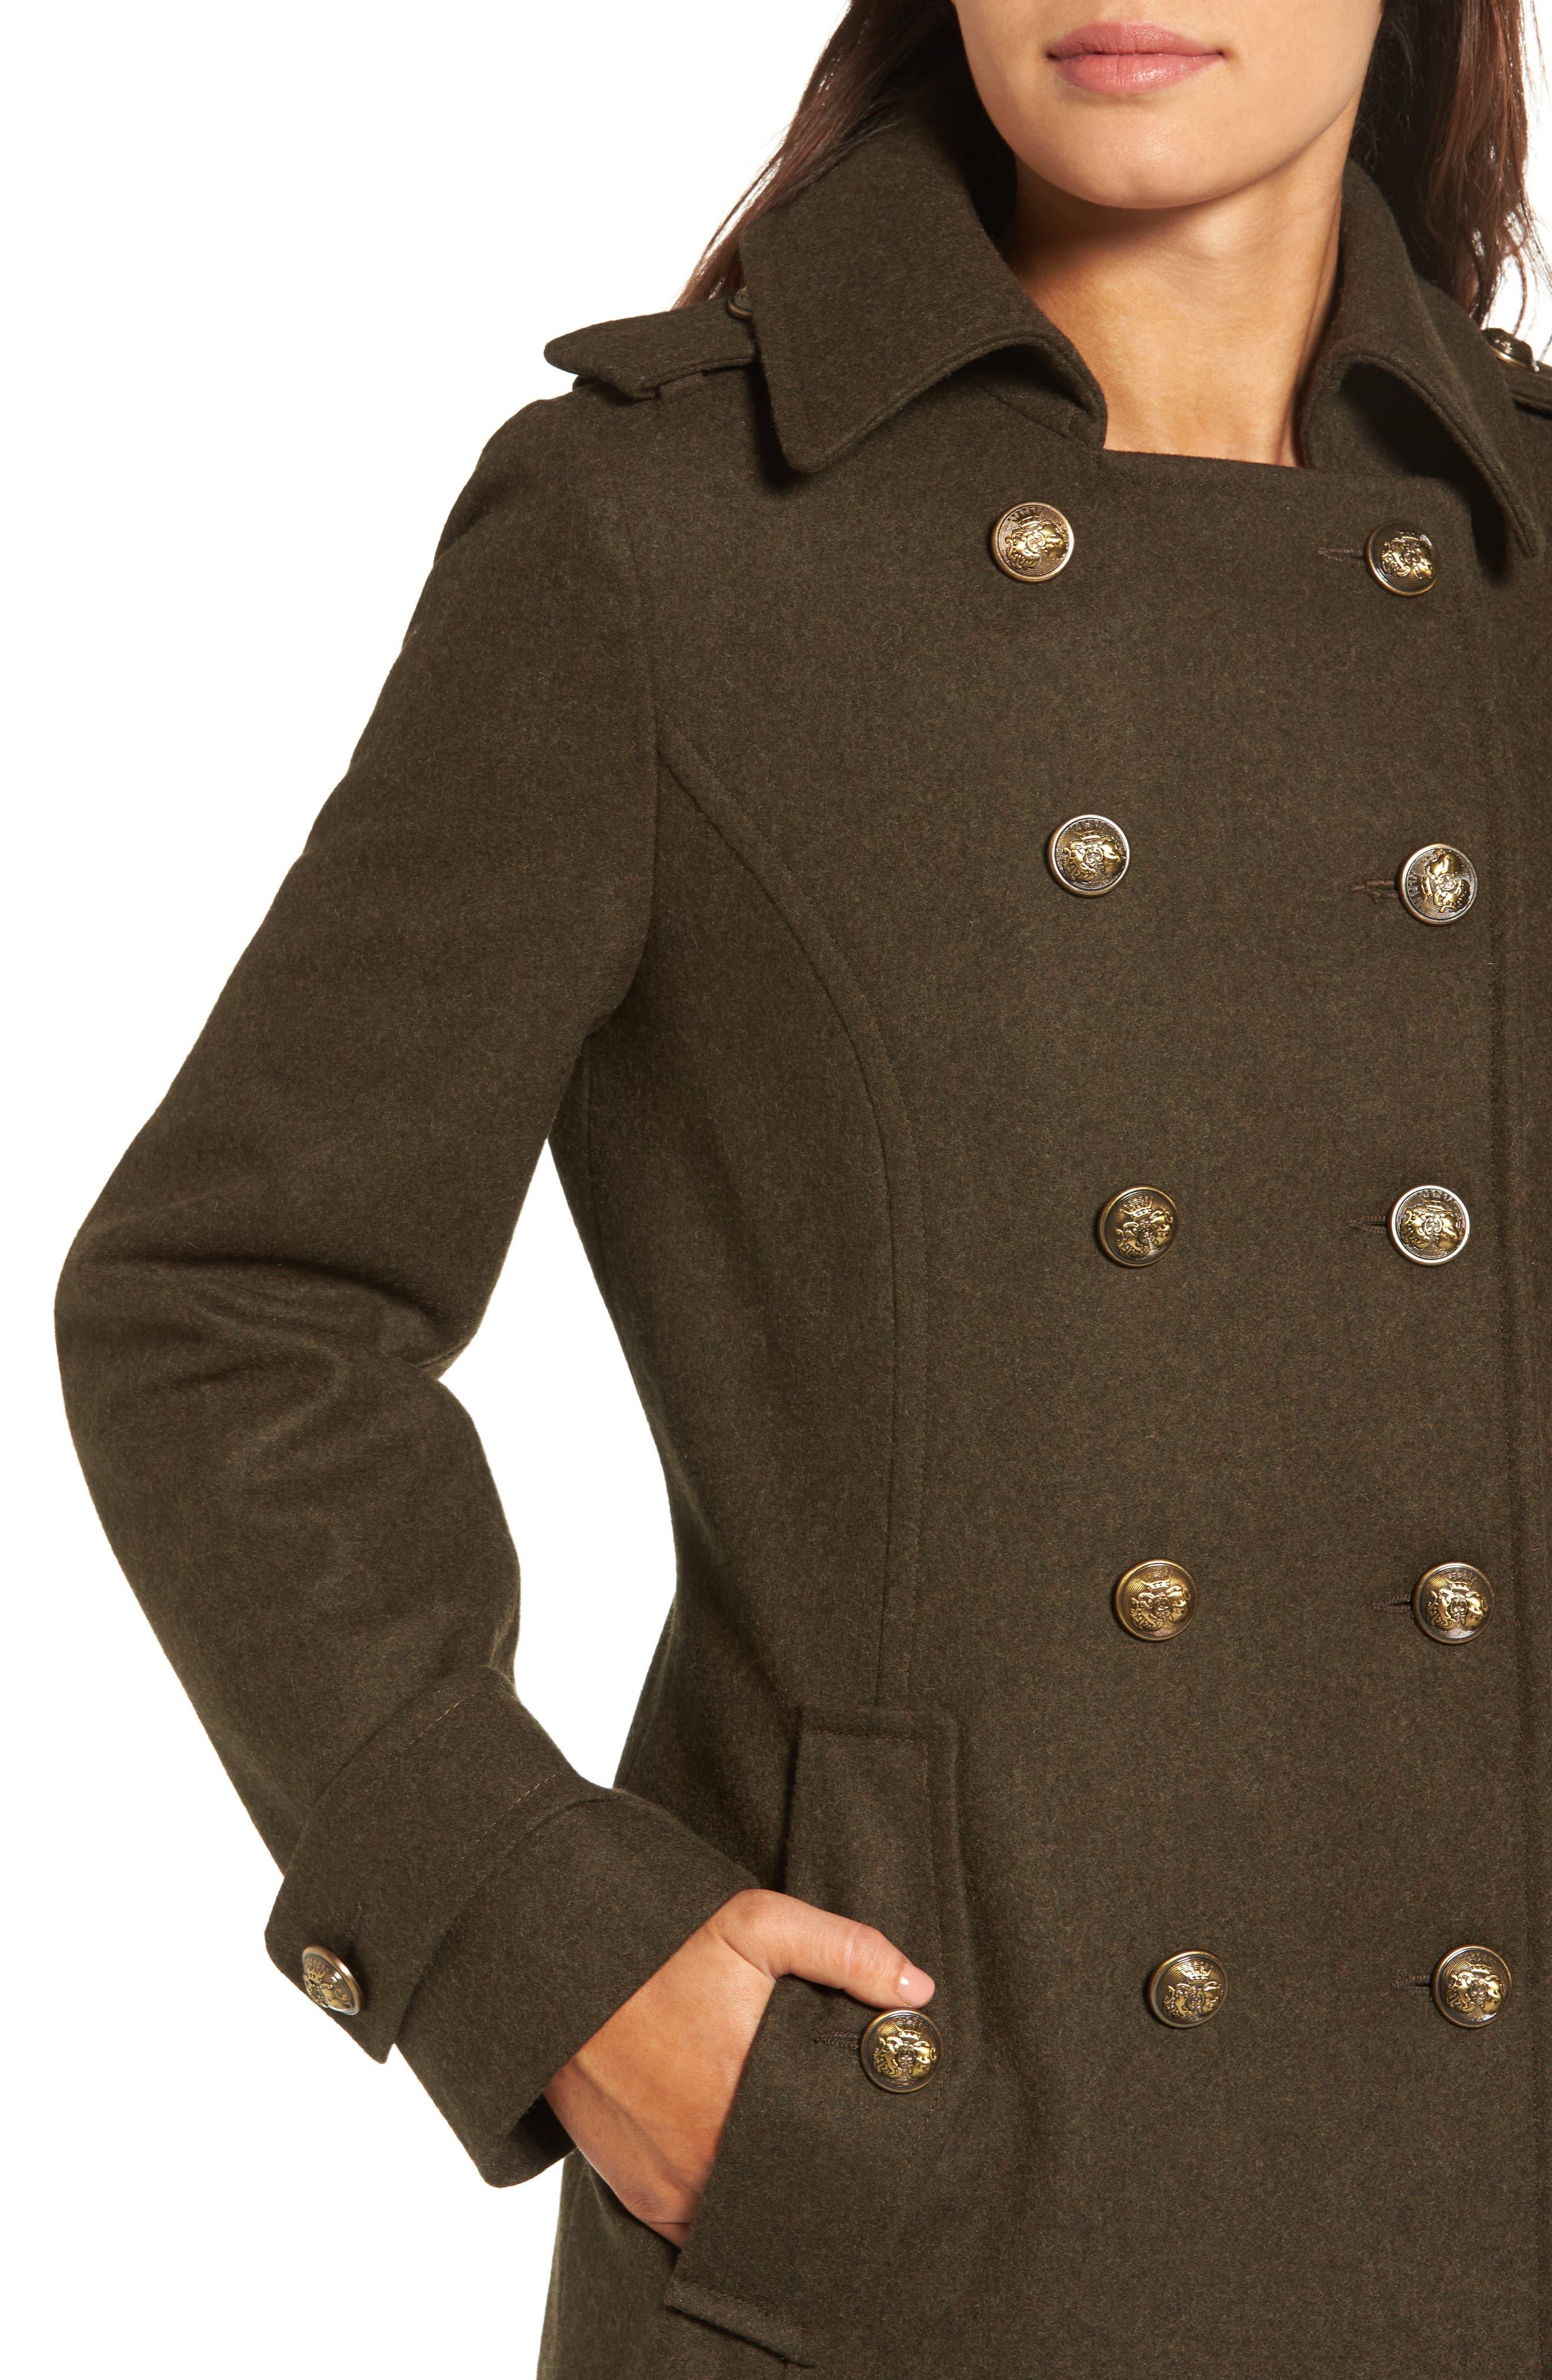 Wool Blend Skirted Military Coat,                             Alternate thumbnail 4, color,                             Olive